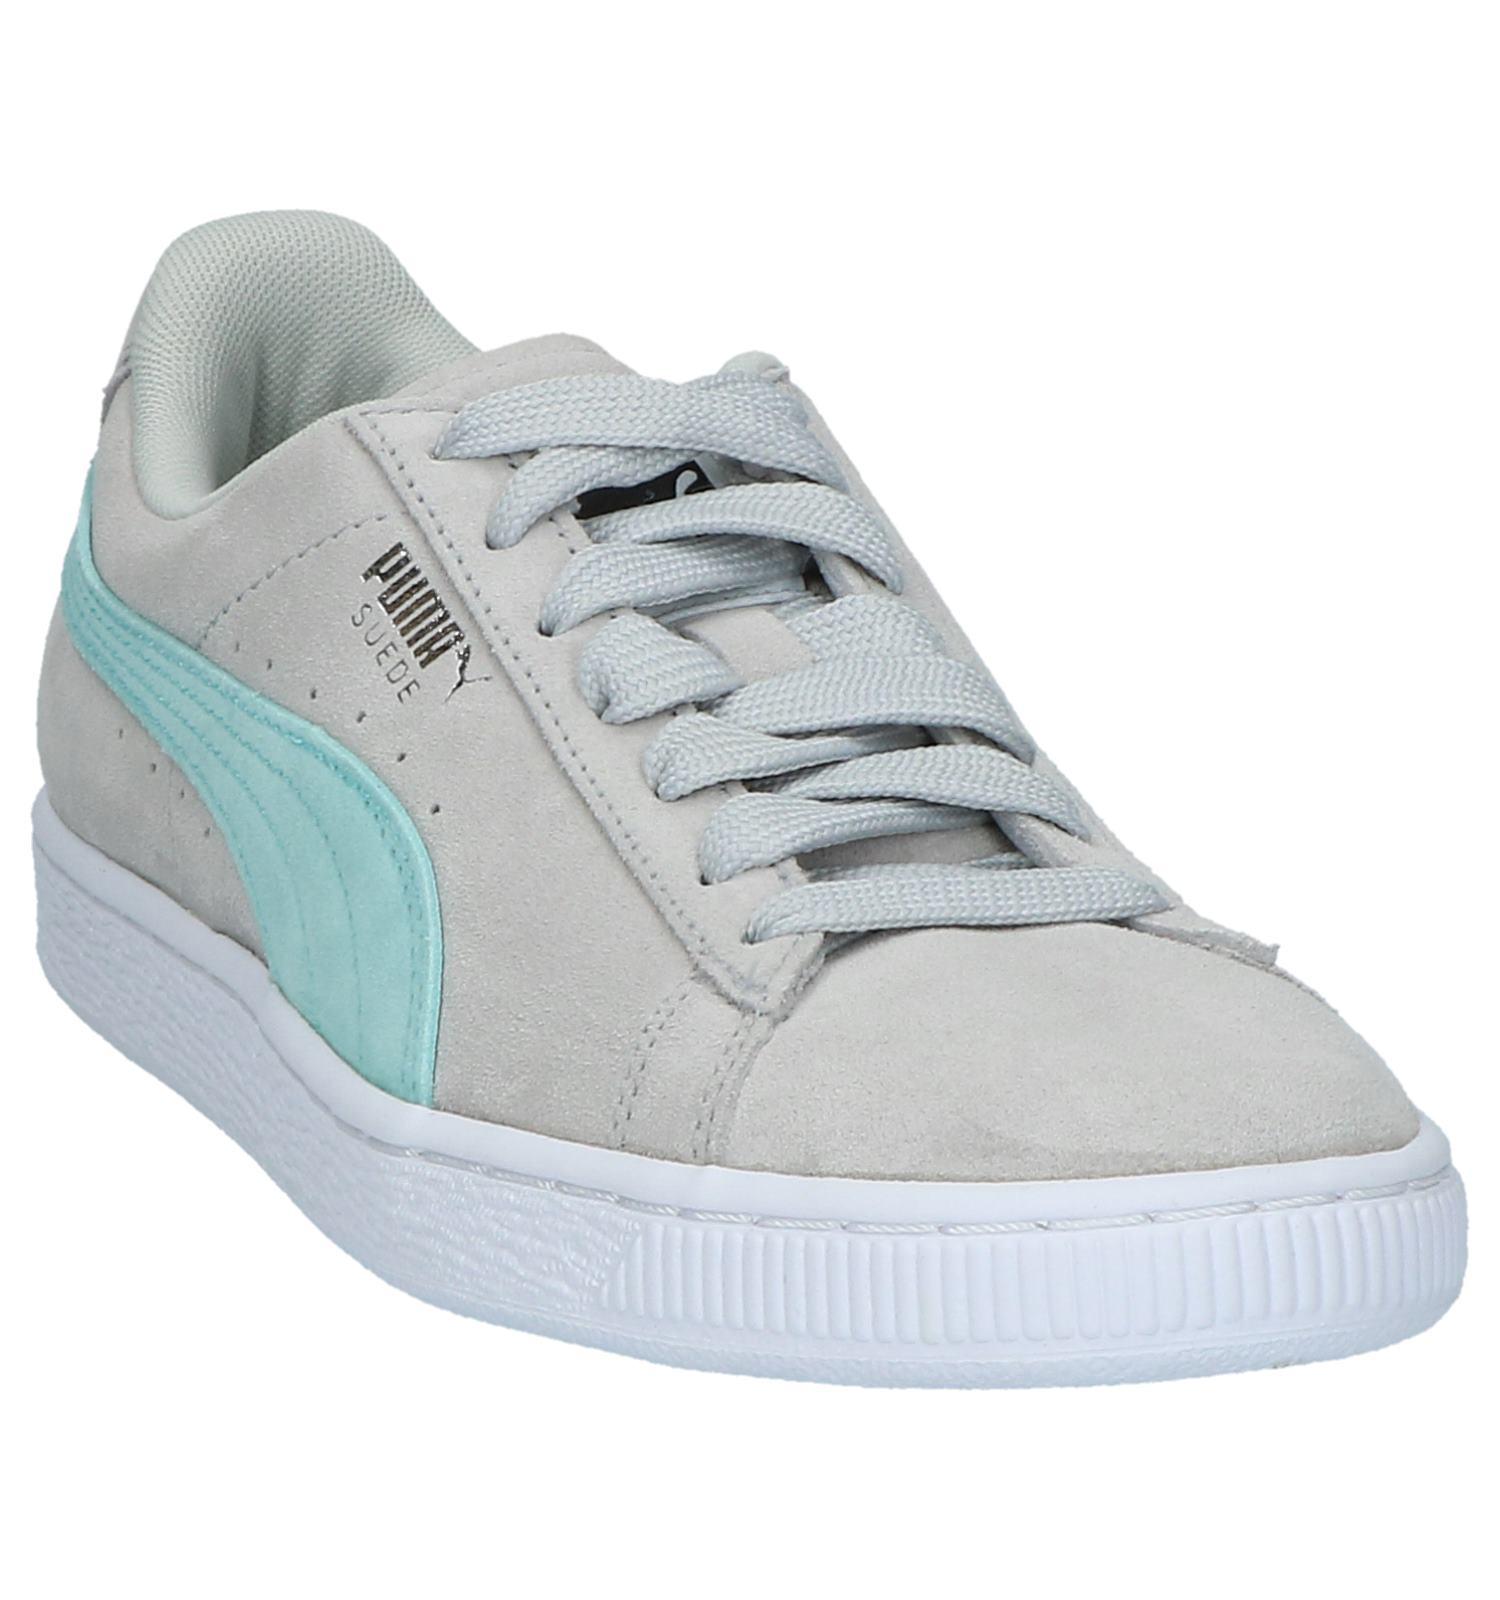 785626a73aa Lichtgrijze Lage Sportieve Sneakers Puma Suede Classic | TORFS.BE | Gratis  verzend en retour